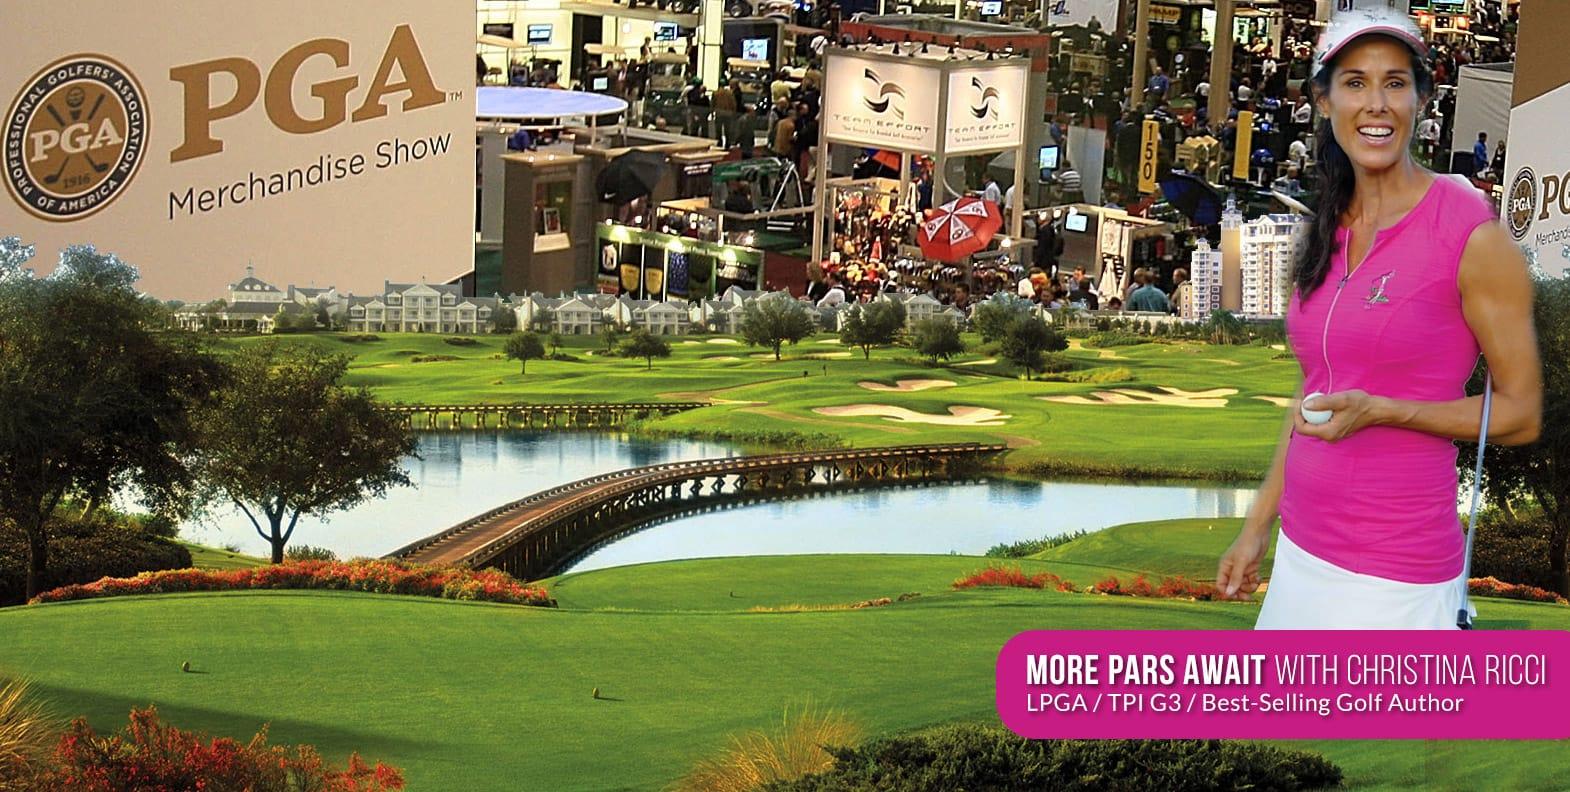 More Pars Florida PGA Show - January 2019